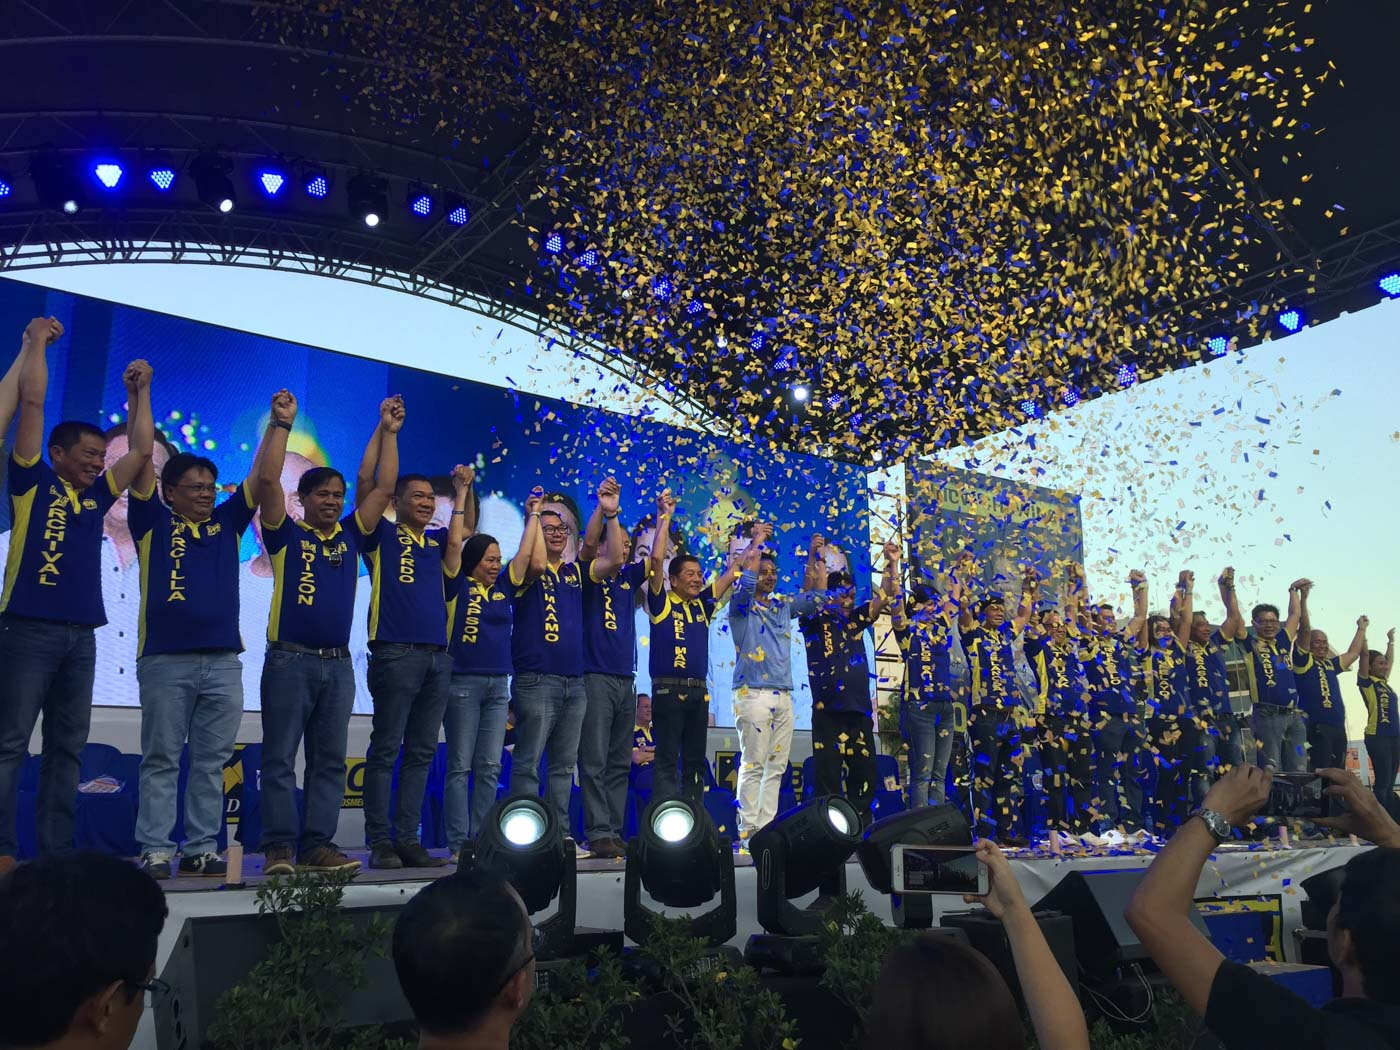 BOPK. Cebu City Mayor Tommy Osmeu00f1a and the rest of Bando Osmeu00f1a Pundok Kauswagan at their proclamation rally on March 30, 2019. Photo by Micole Gerard Tizon/Rappler